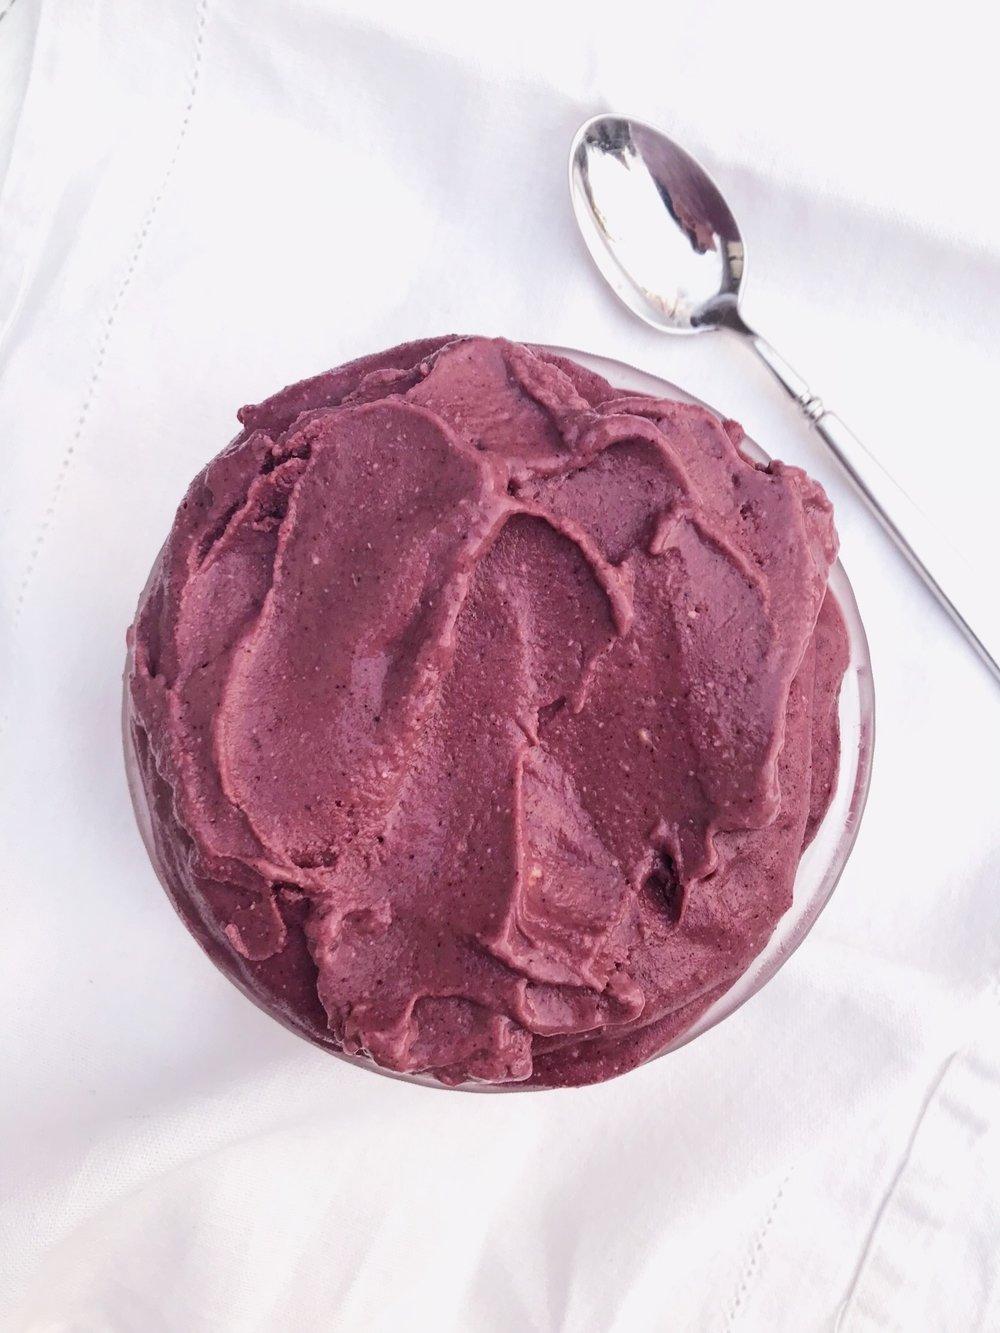 line & lee breakfast ice cream